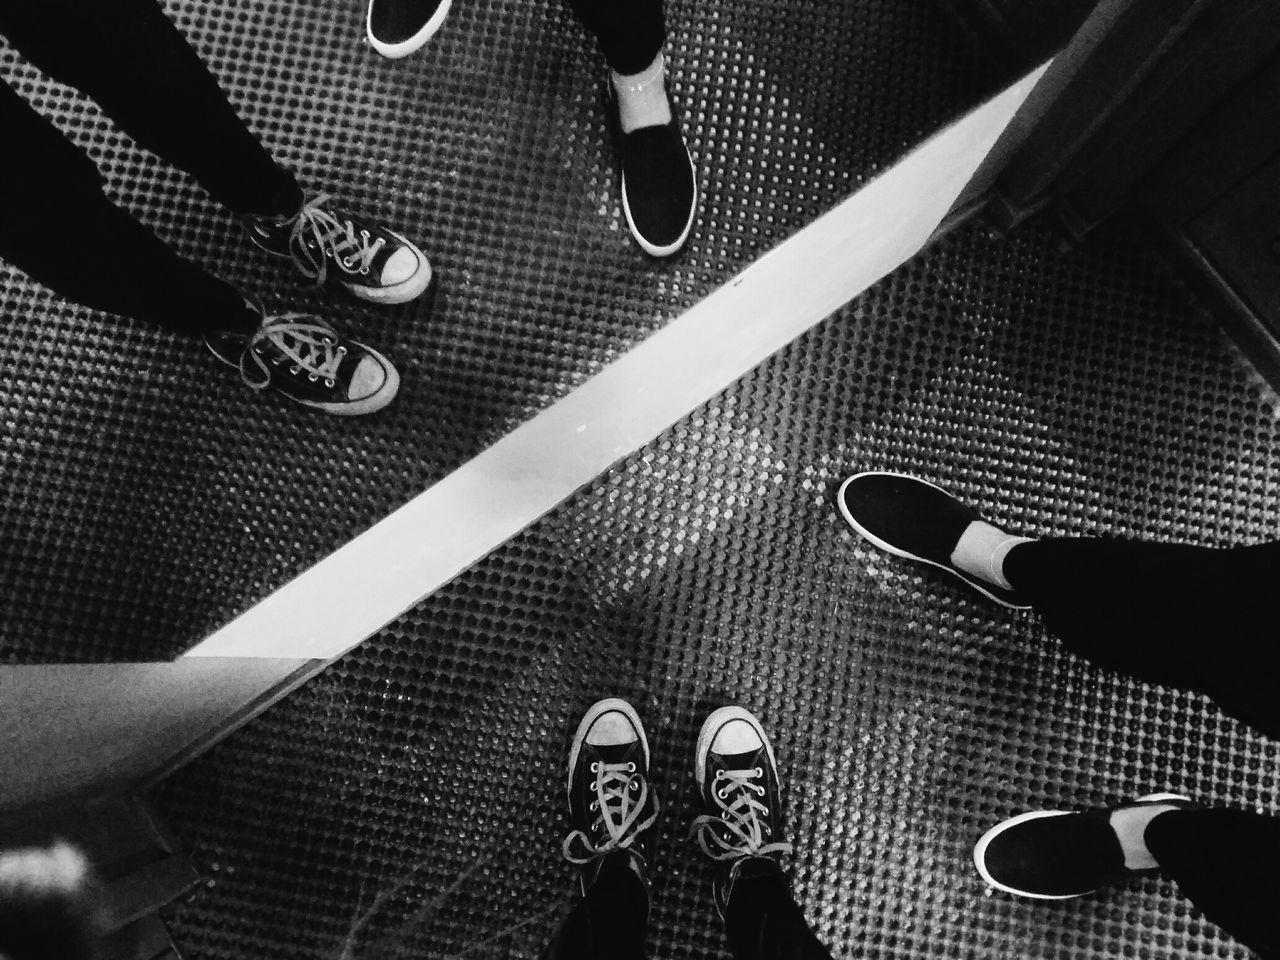 Shoes Indoors  Mirror Reflection Night Blackandwhite Photography EyeEm Bnw Girls BYOPaper! B&W Collection B&w Photography Mirror Moment Friendship Converse